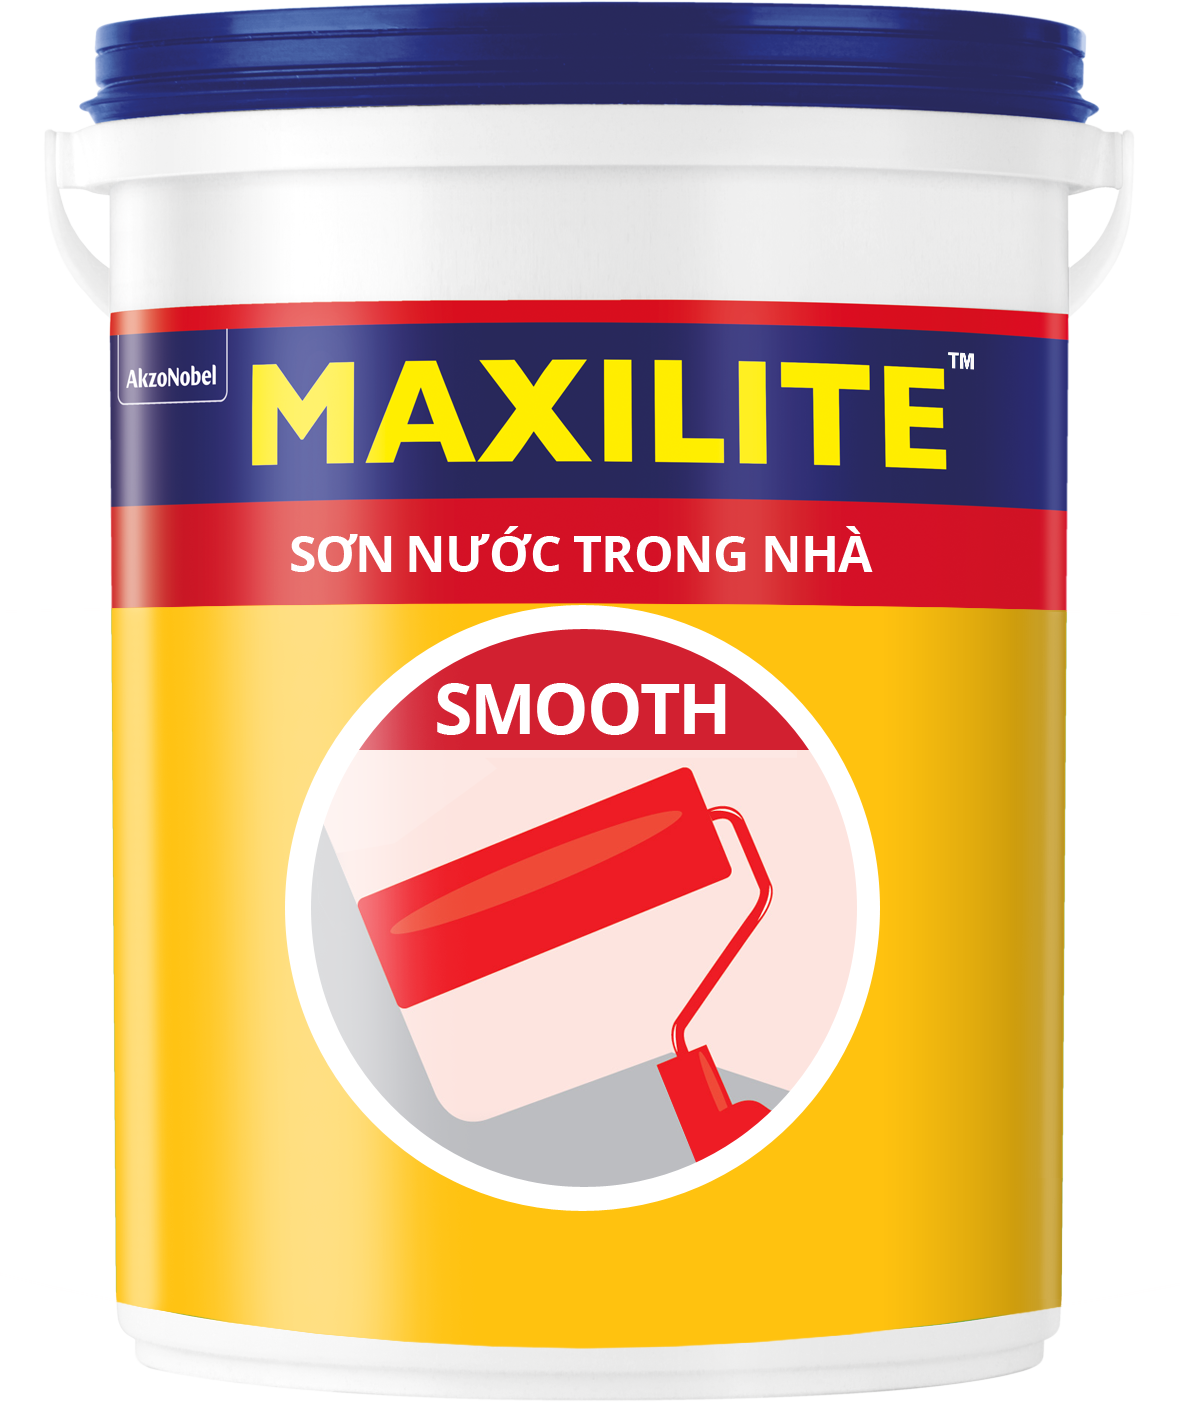 son_nuoc_trong_nha_smooth